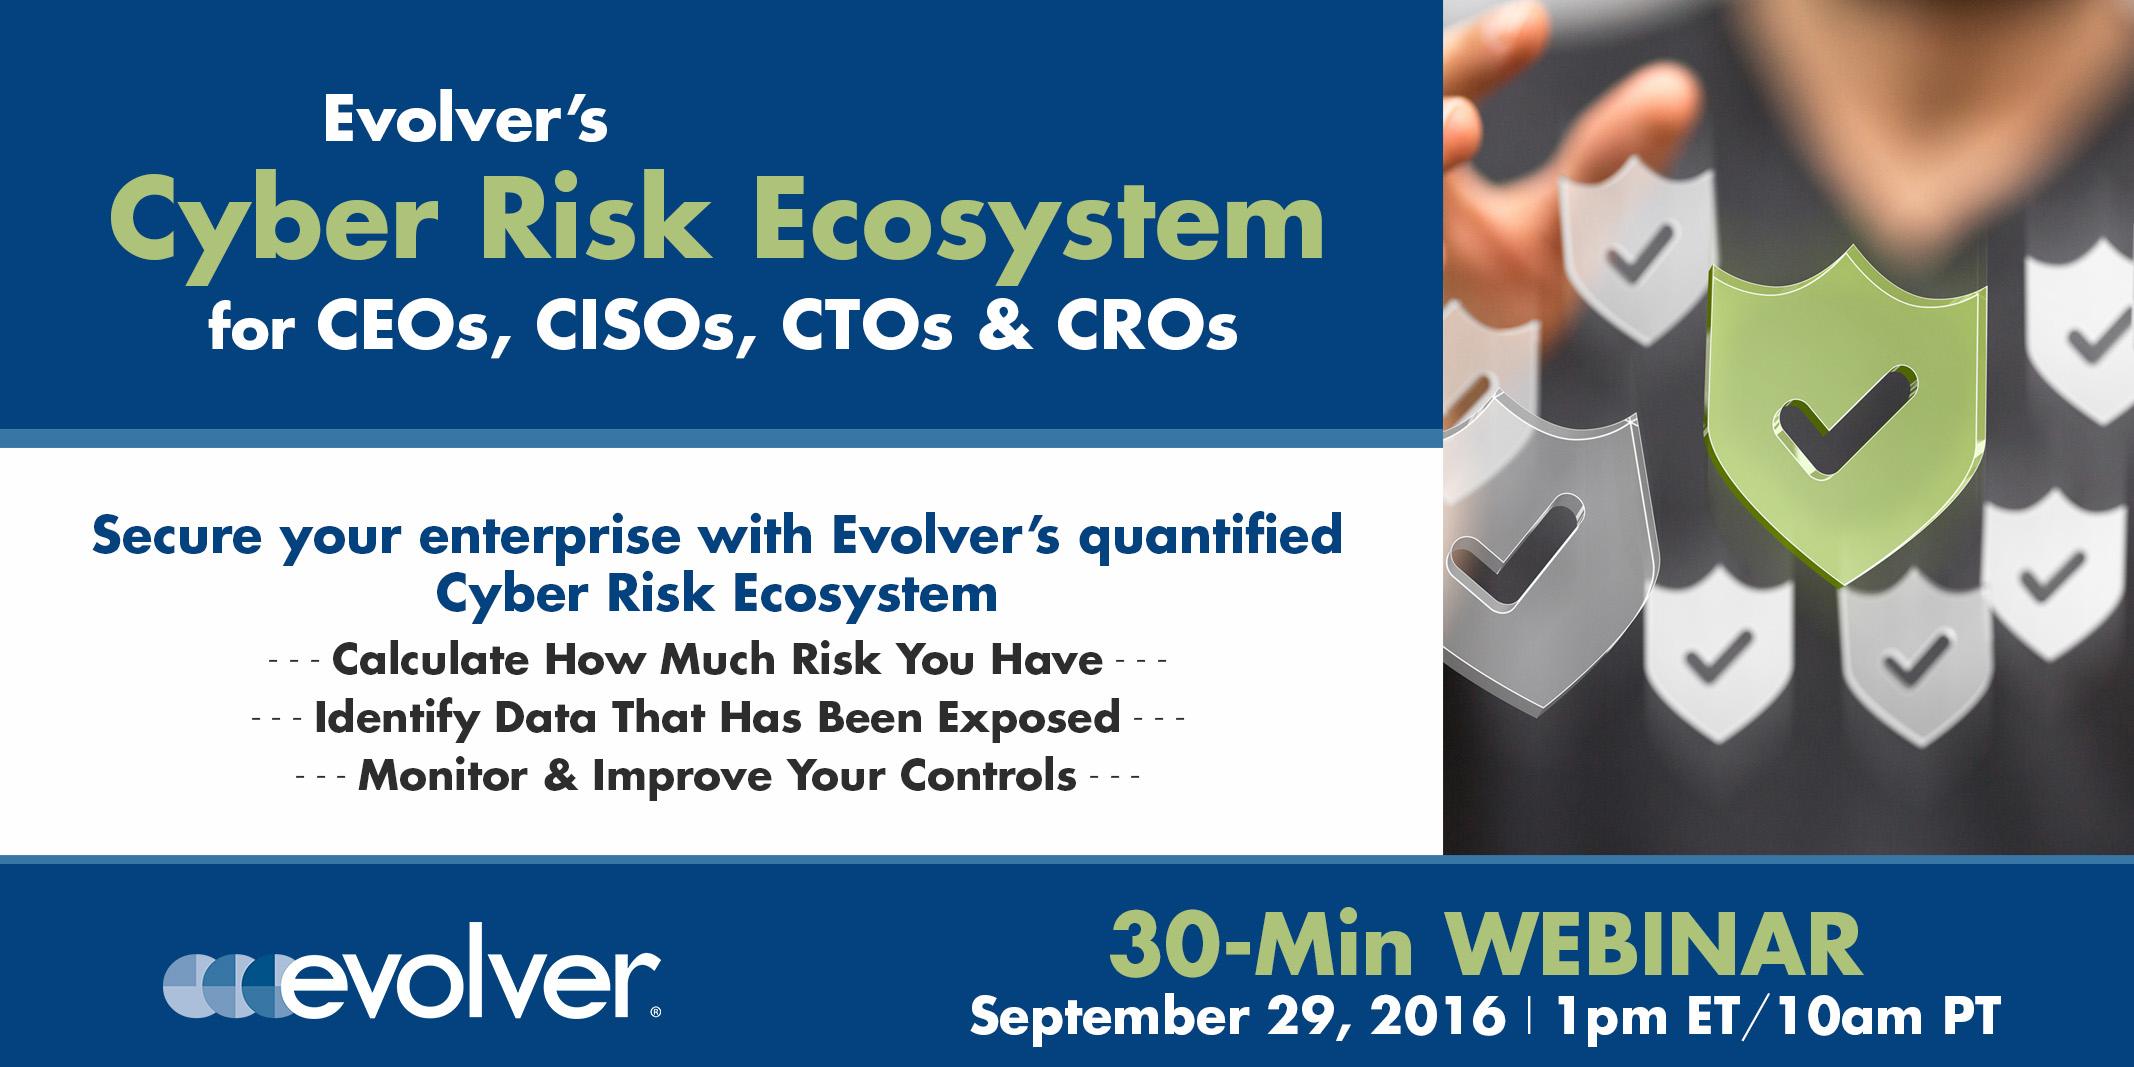 Evolver Cyber Risk Ecosystem Webinar